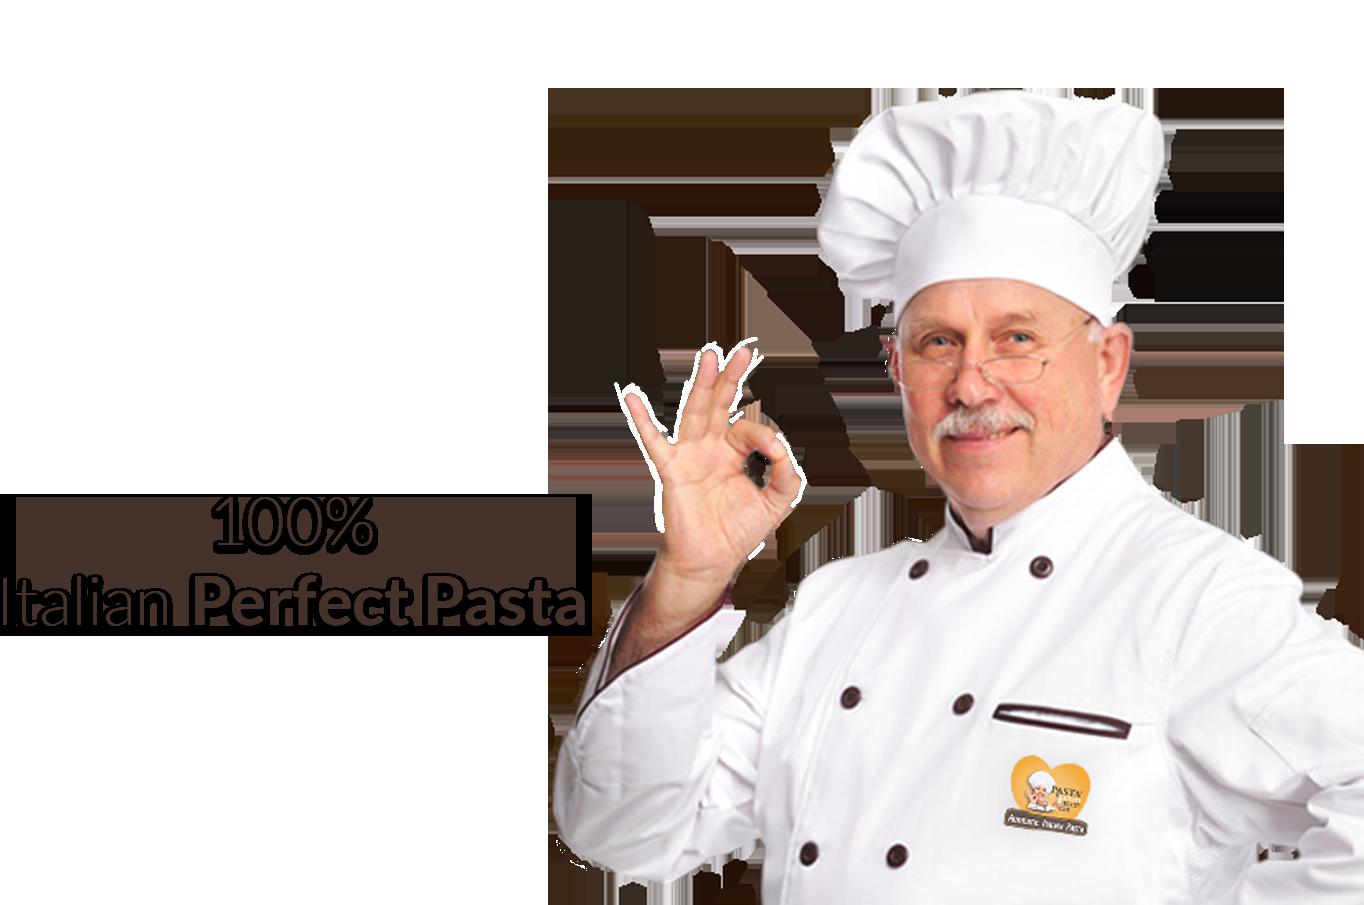 Italian 100% Perfect Pasta